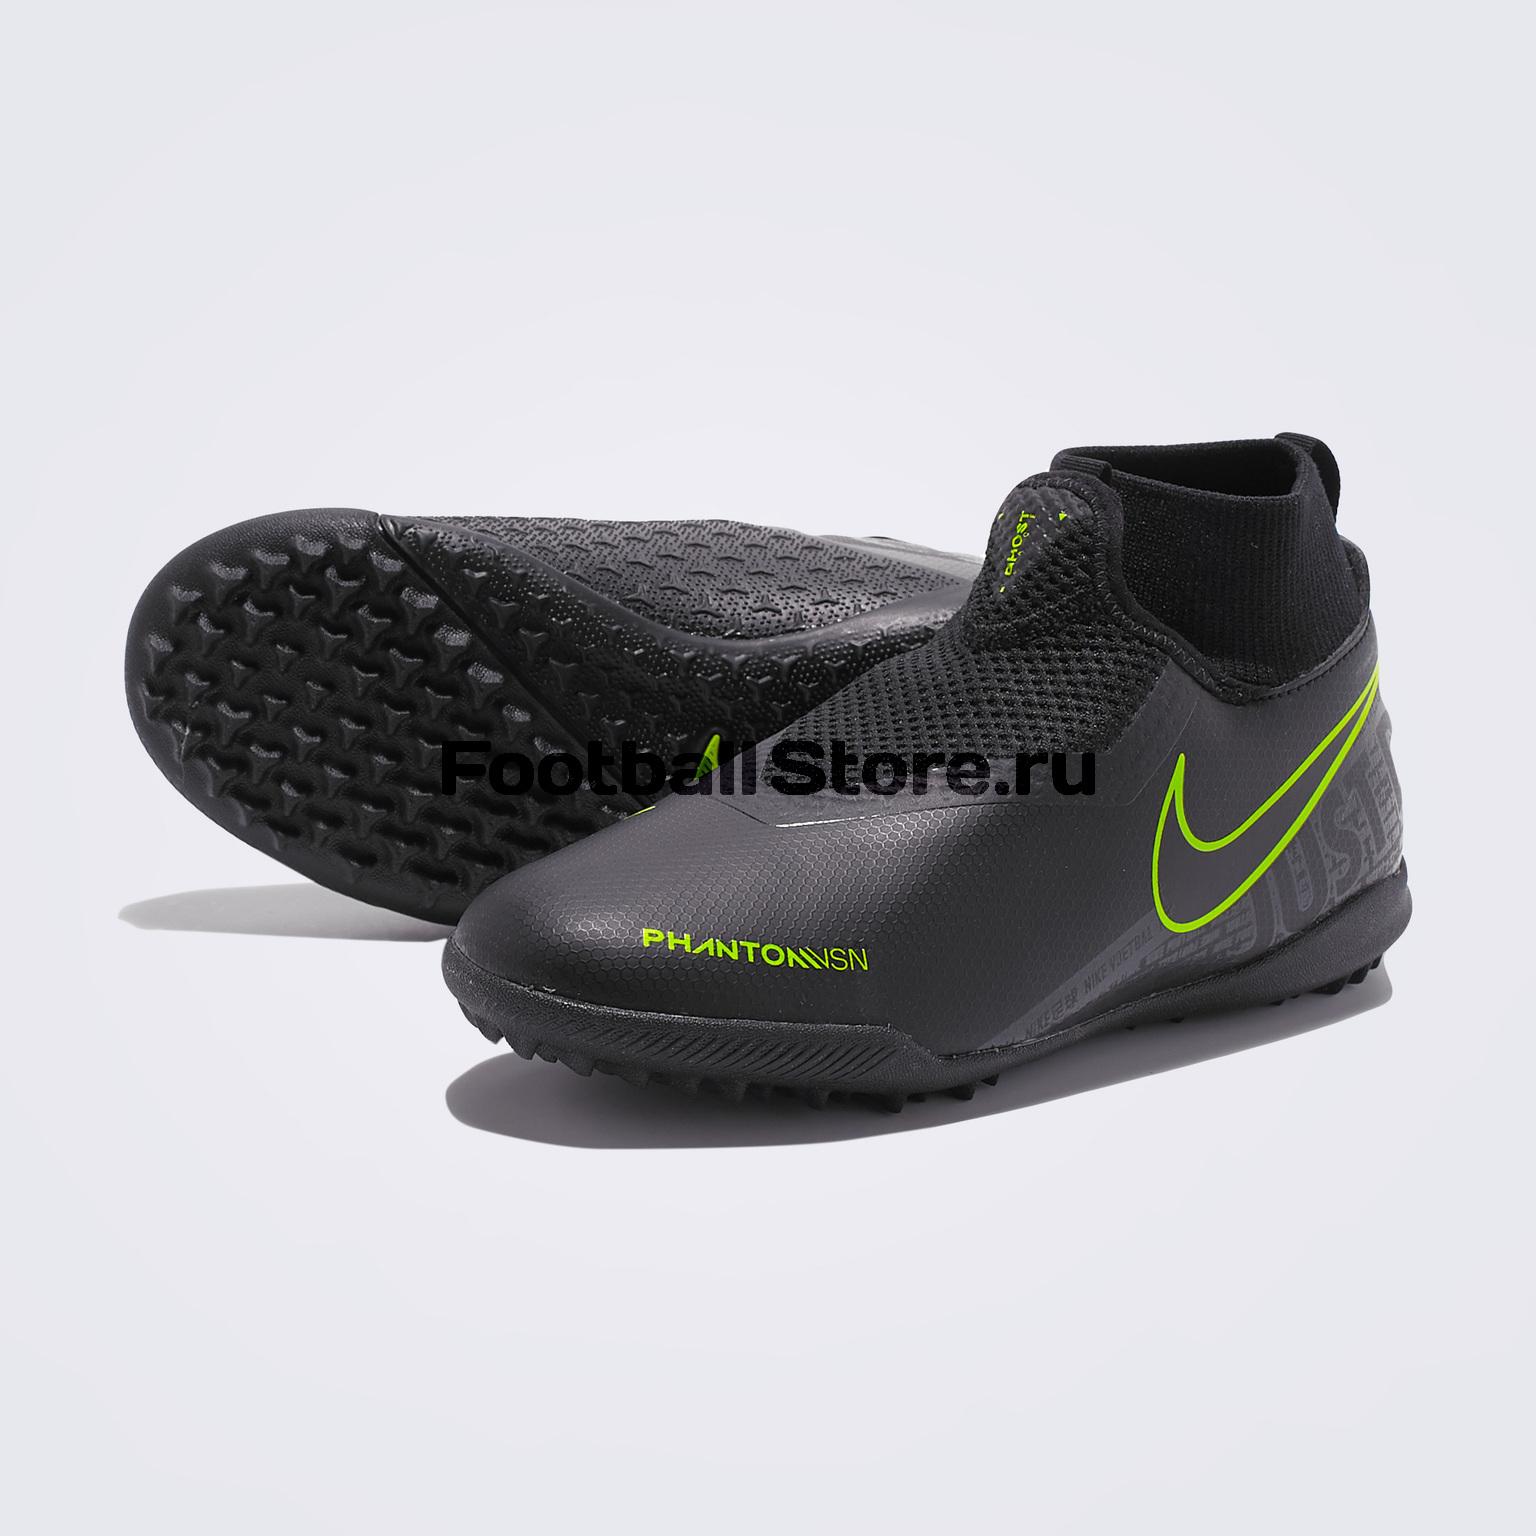 Шиповки детские Nike Phantom Vision Academy DF TF AO3292-007 цена